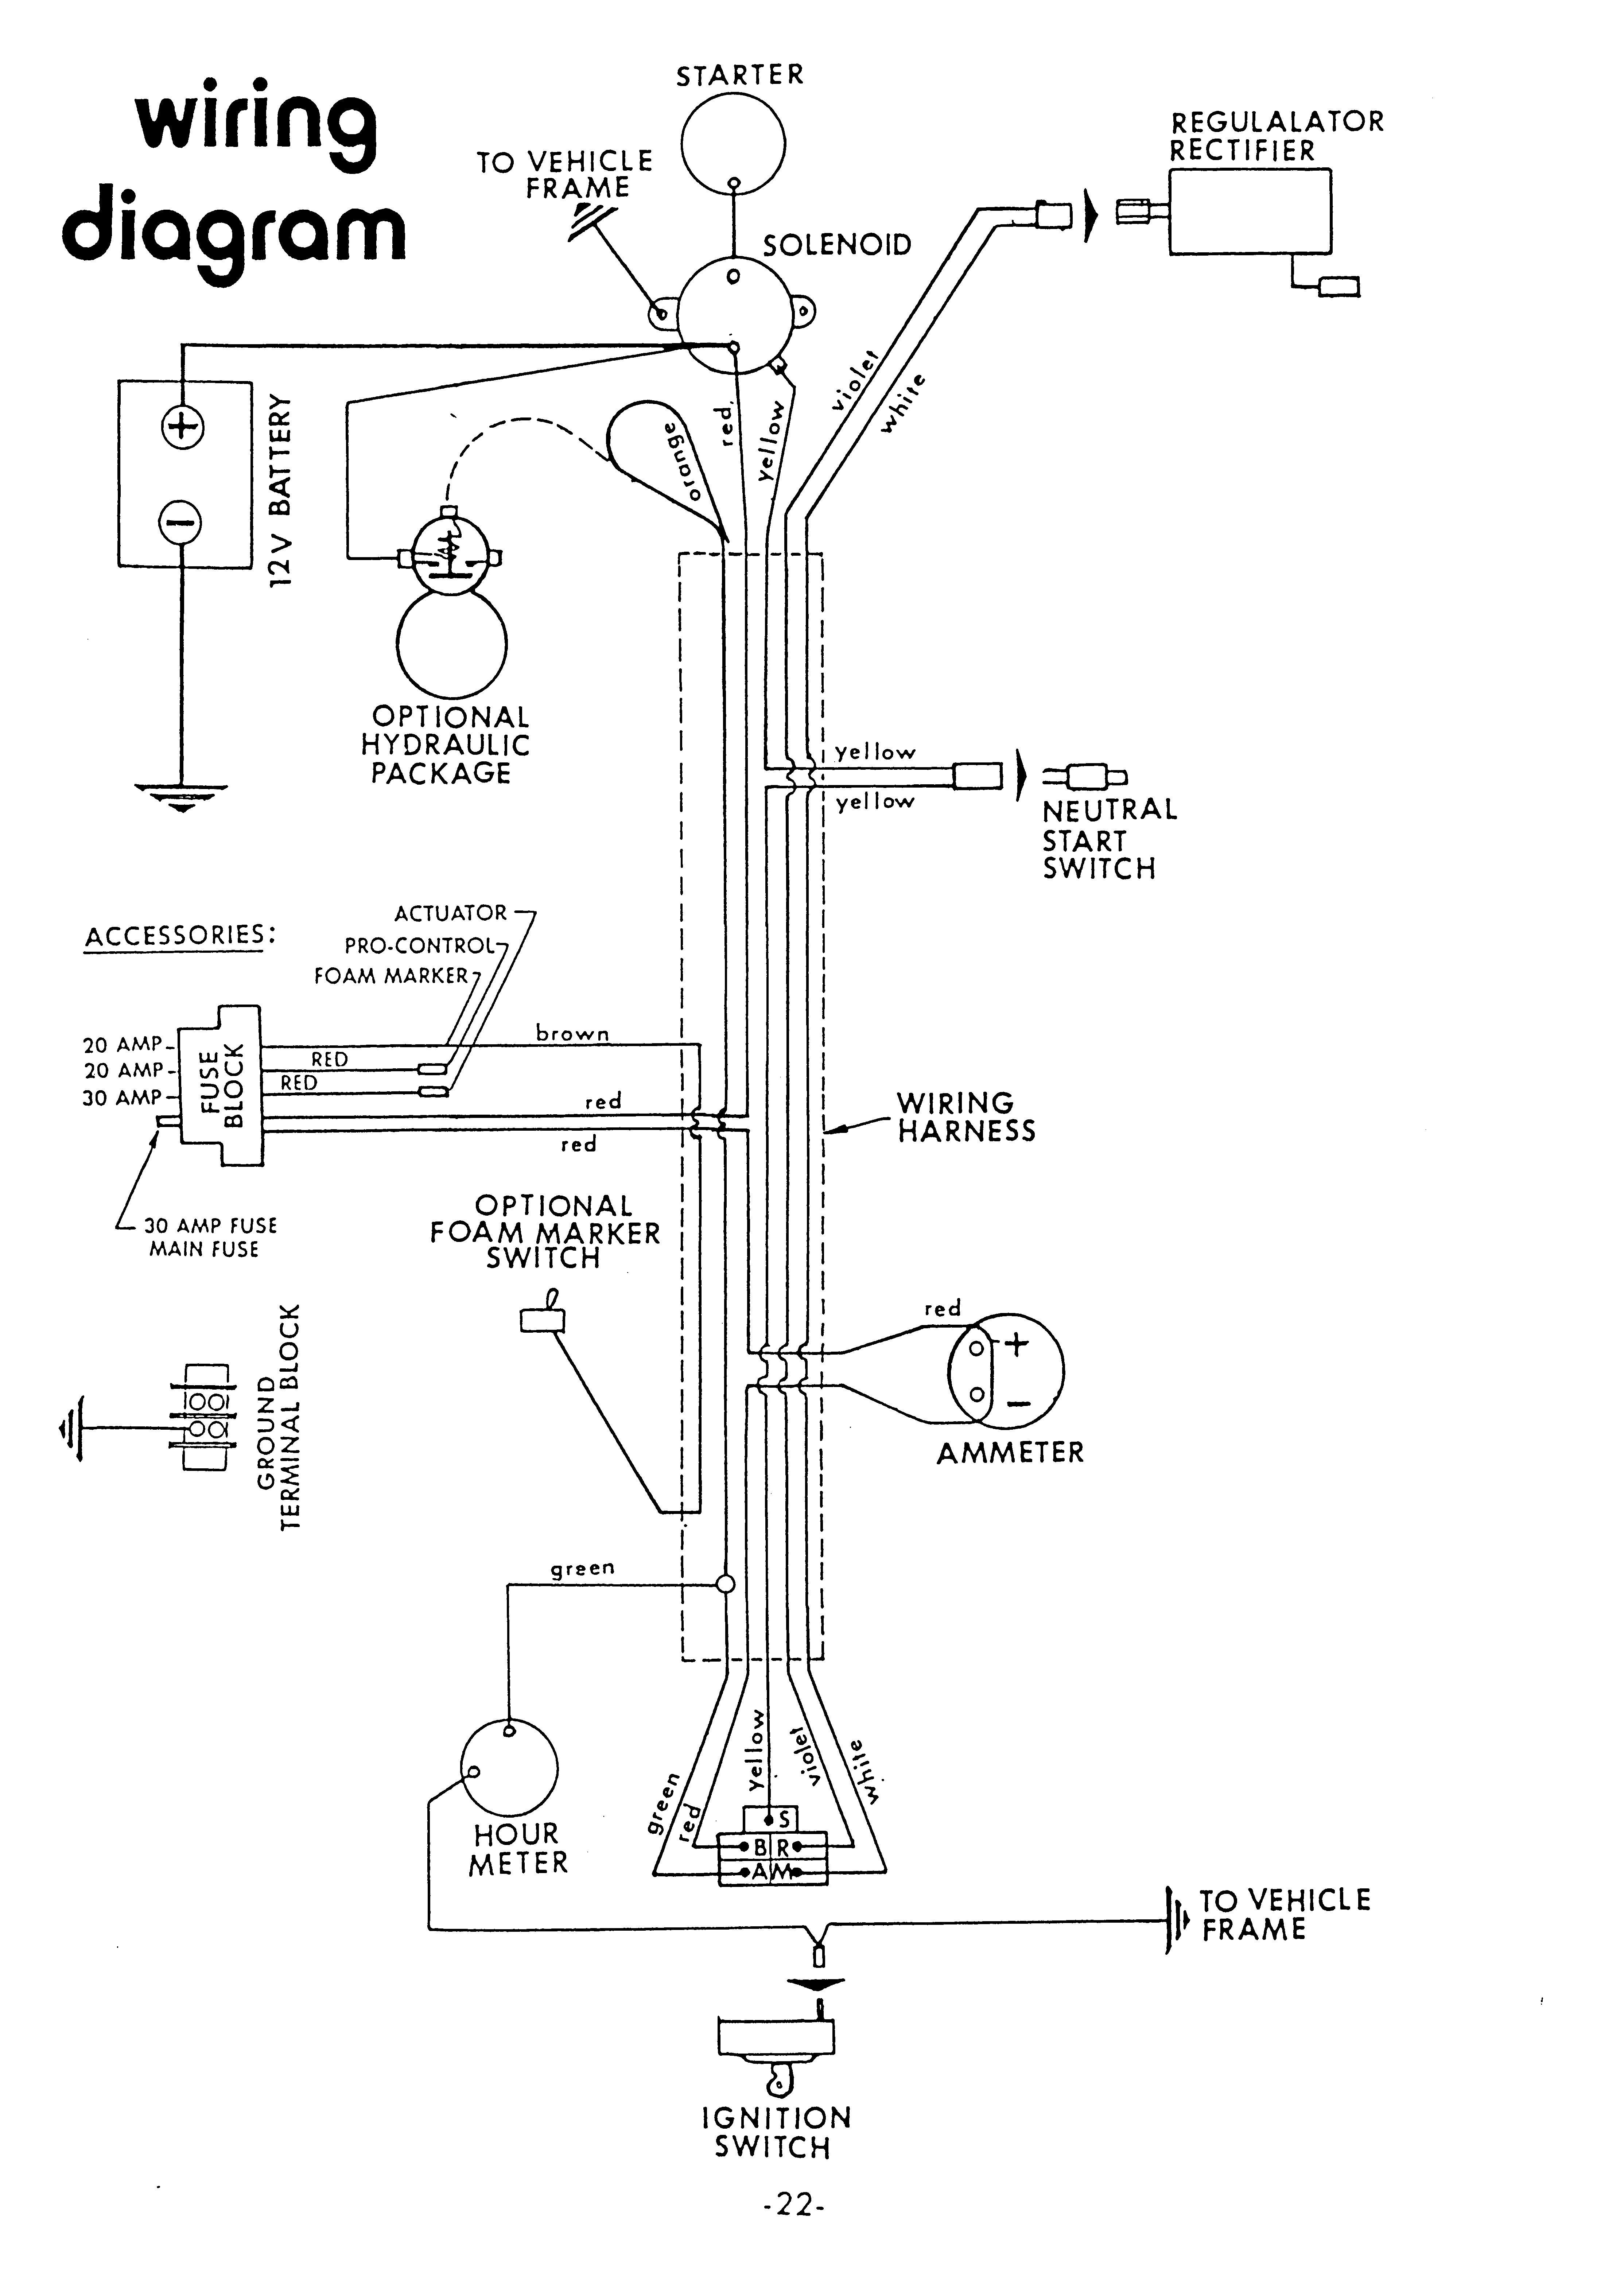 Kohler Engine Wiring Diagram Kohler Ignition Switch Wiring Diagram Inspirationa Cv20 Kohler Of Kohler Engine Wiring Diagram